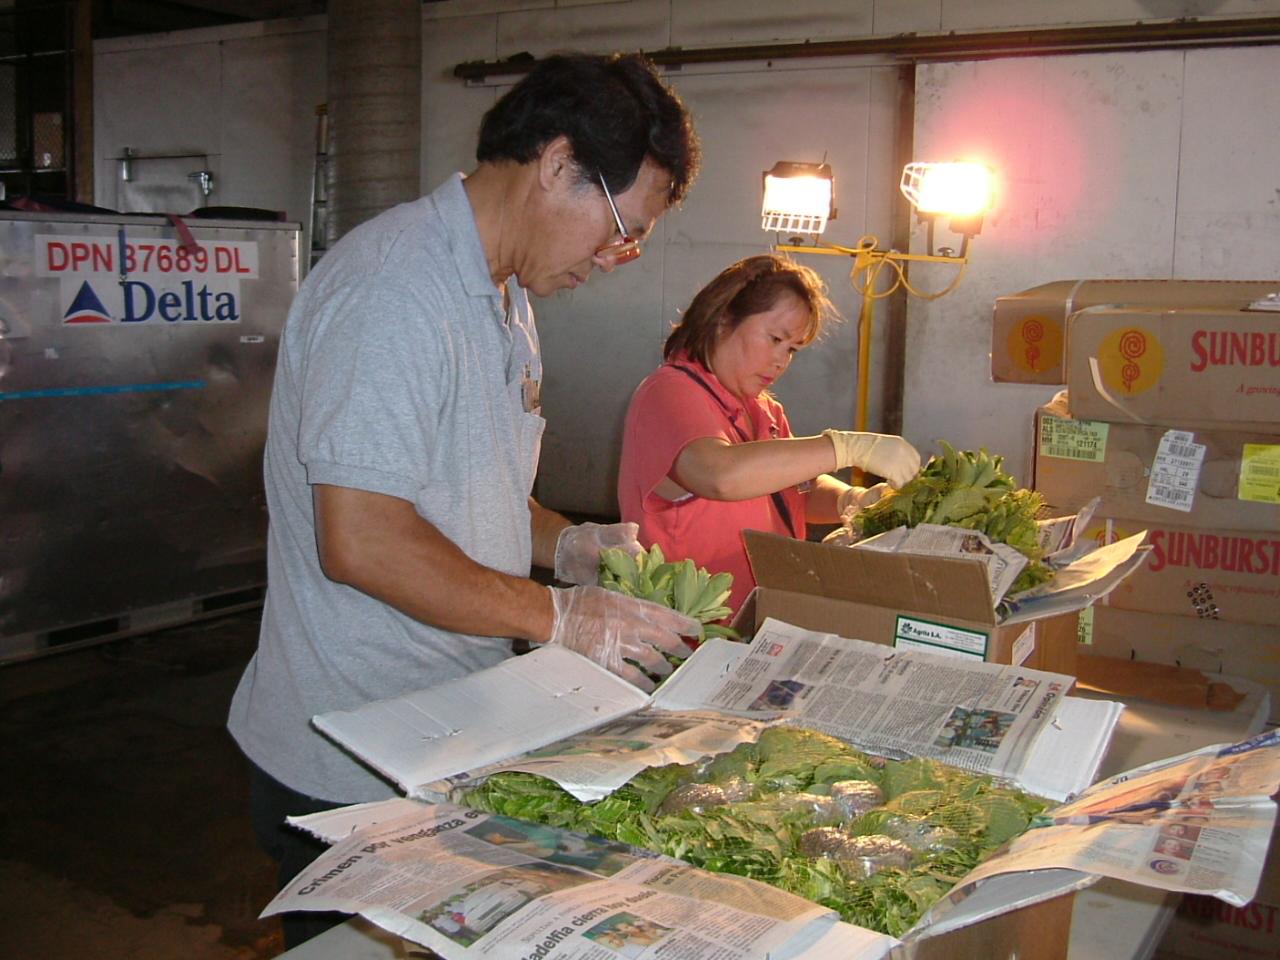 Inspecting ornamental plants.